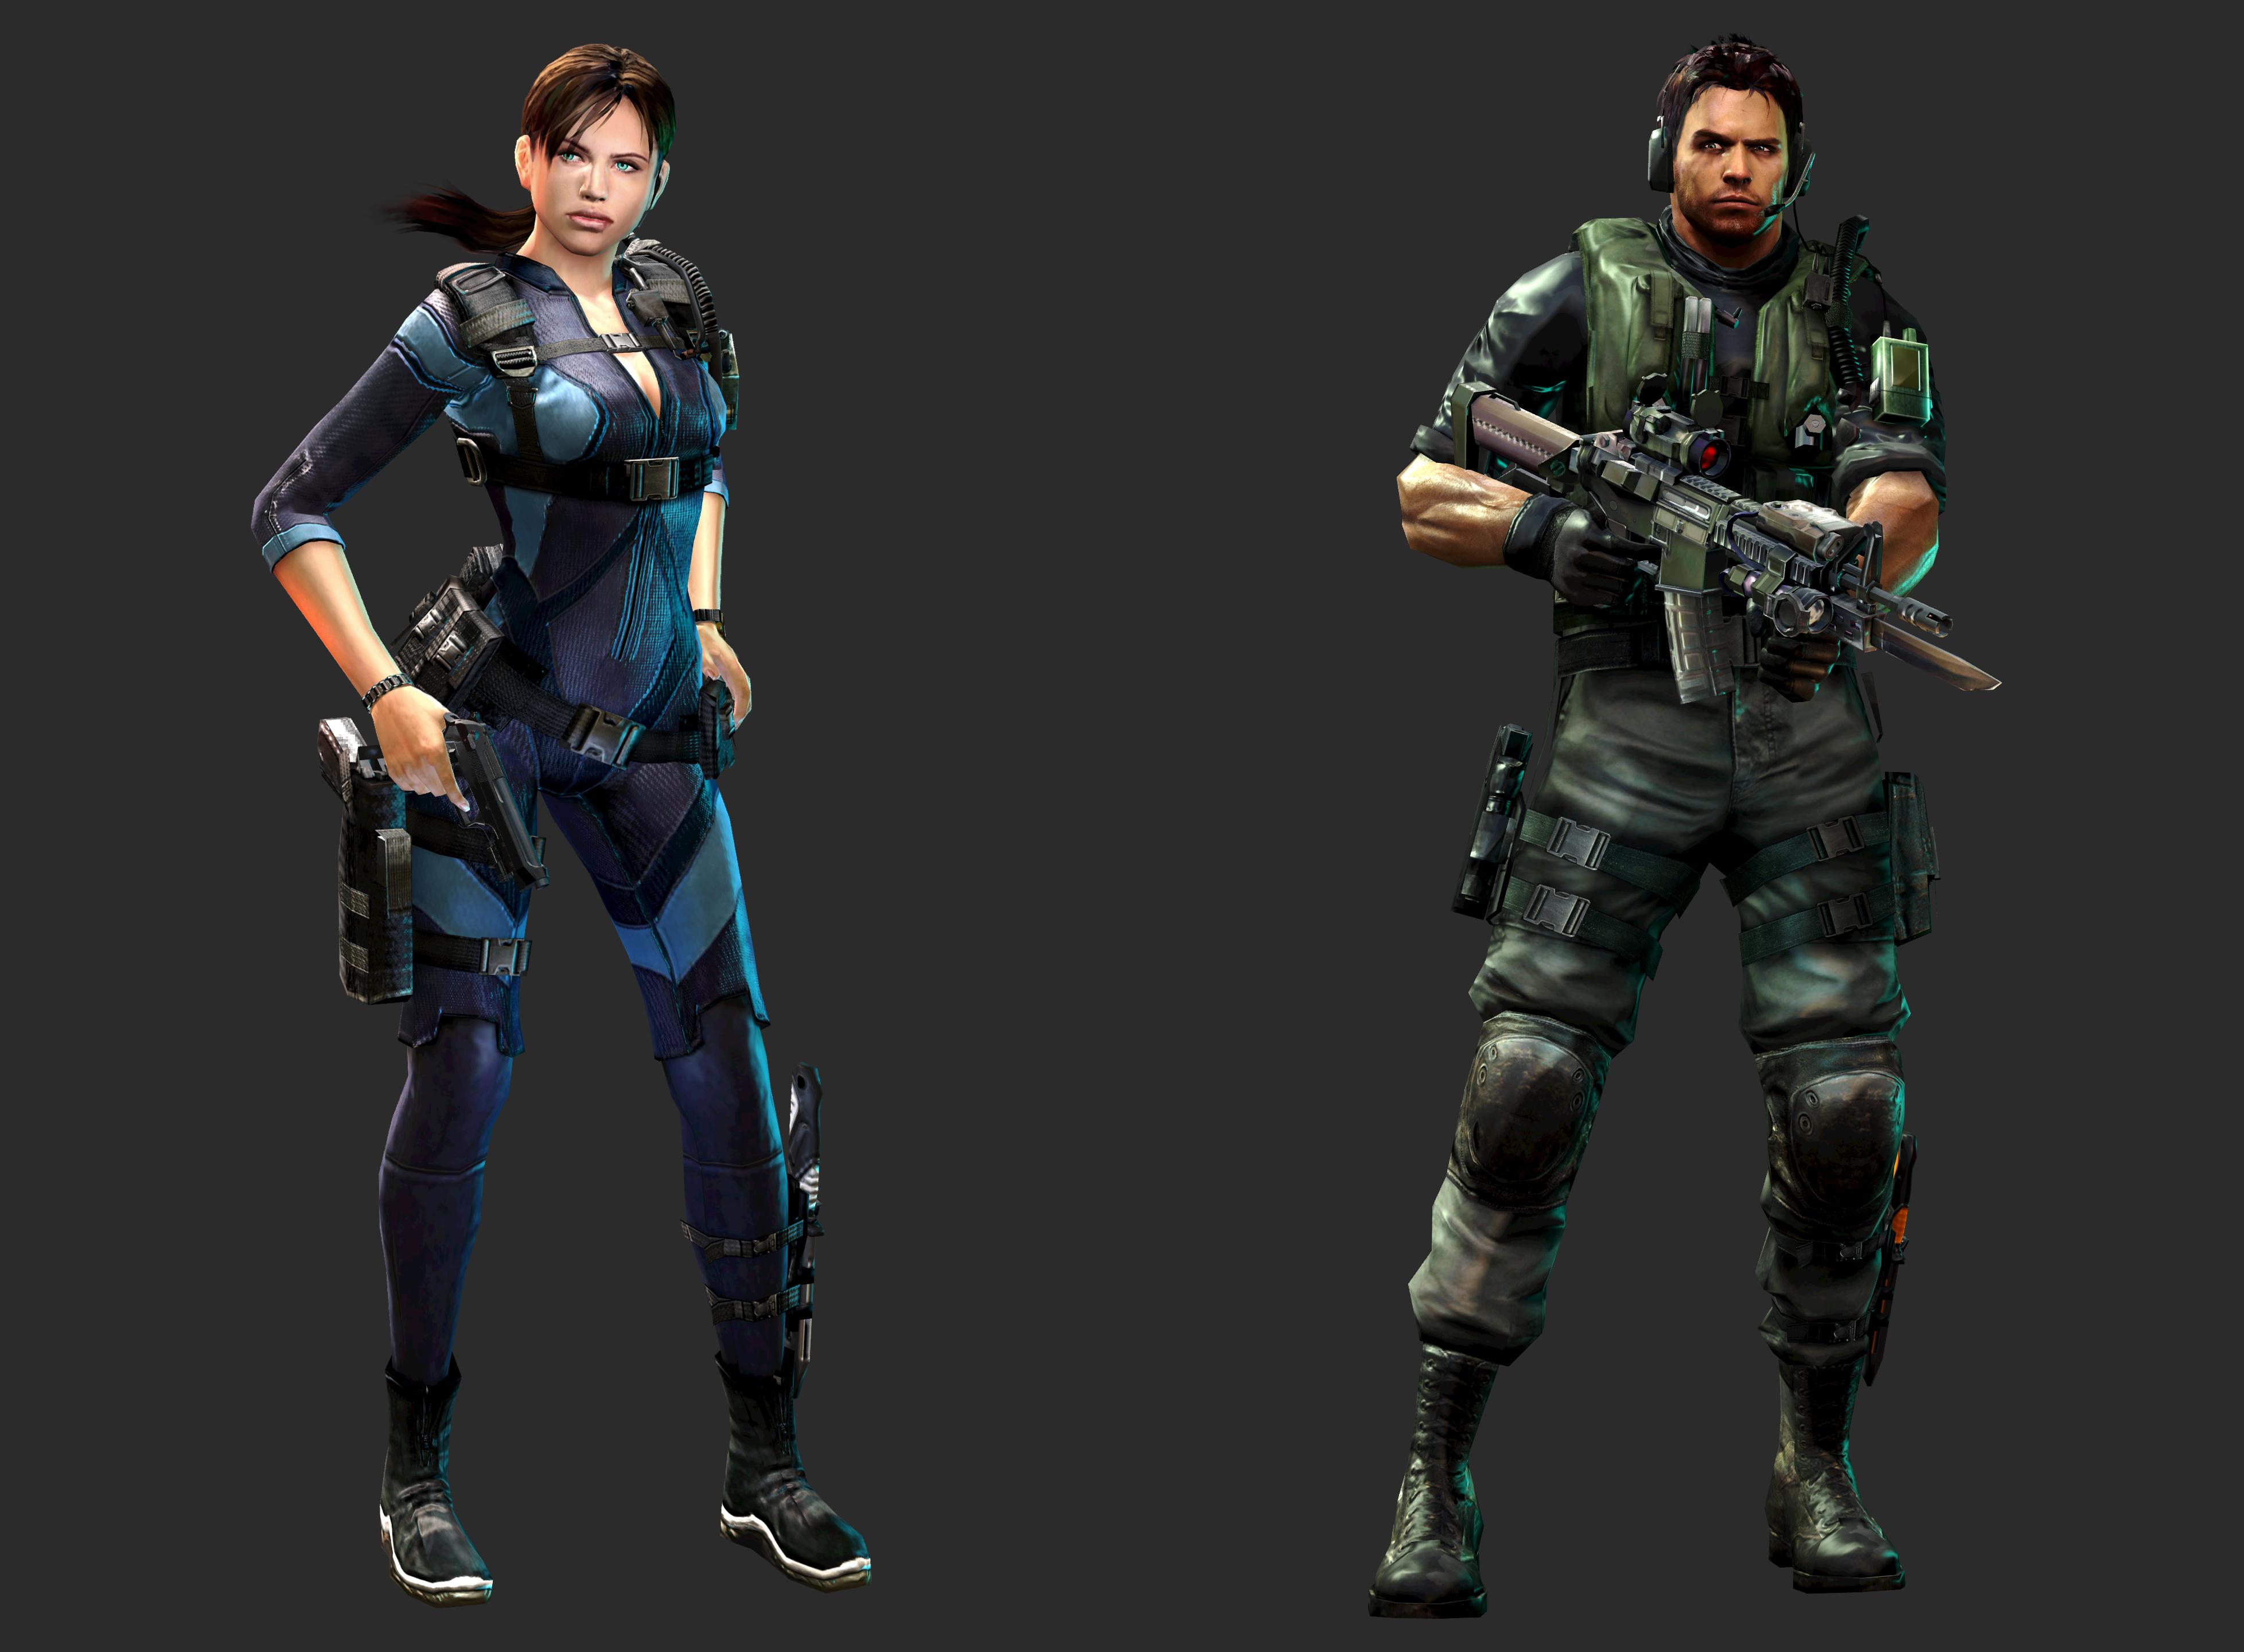 Chris Redfield Jill Valentine Resident Evil by stalkersdxx on DeviantArt